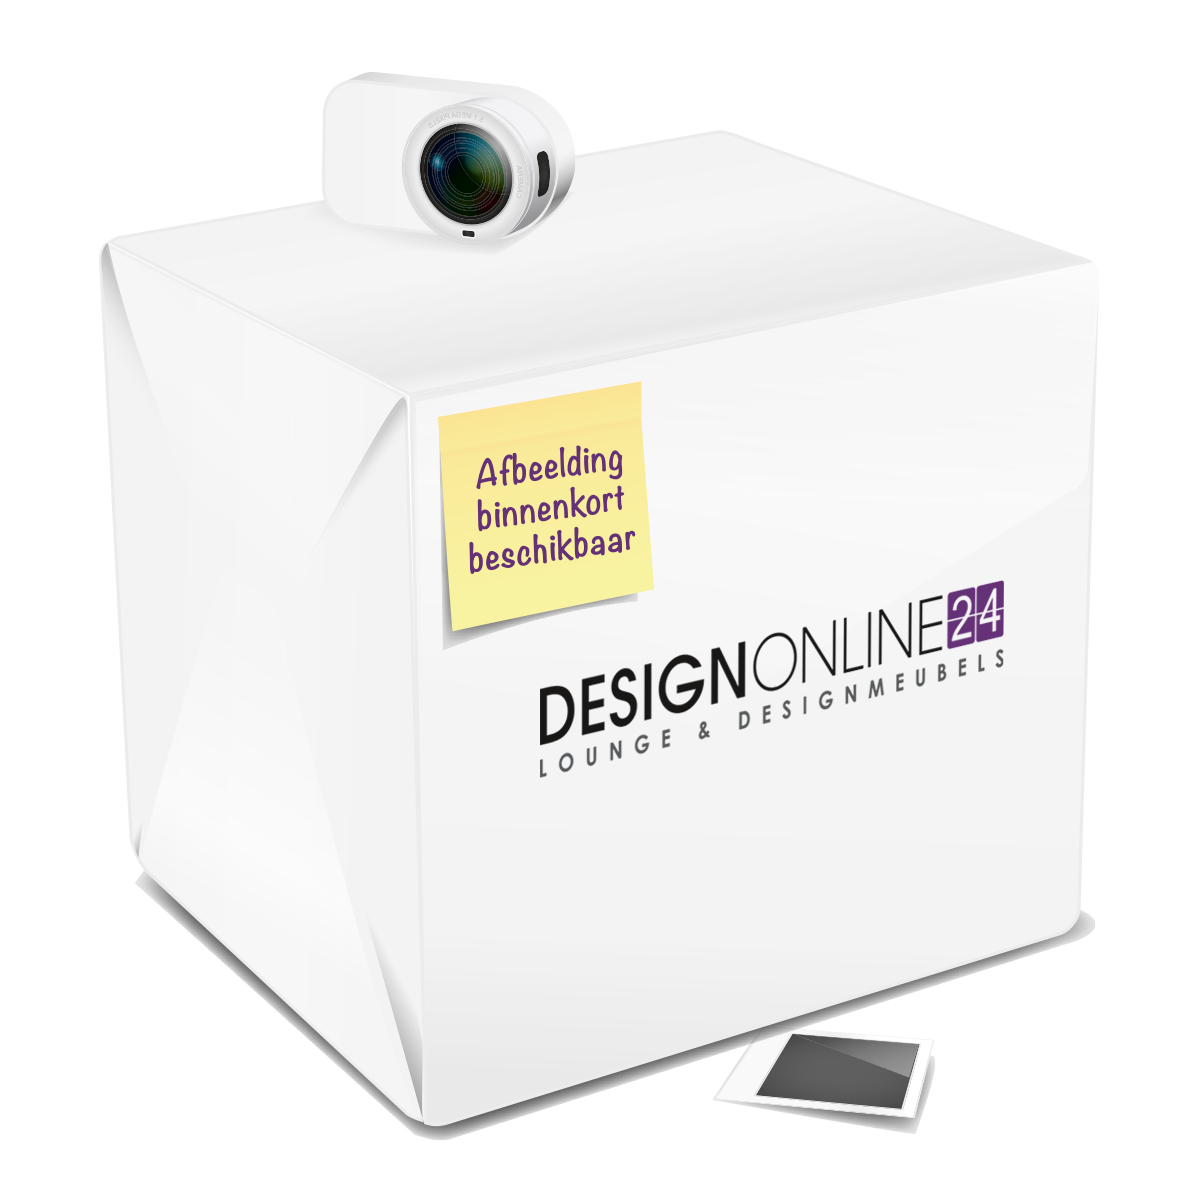 24Designs 24Designs Loungeset 6 Personen - Cecina - Zandkleur Polyrattan Wicker met Crèmewitte kussens